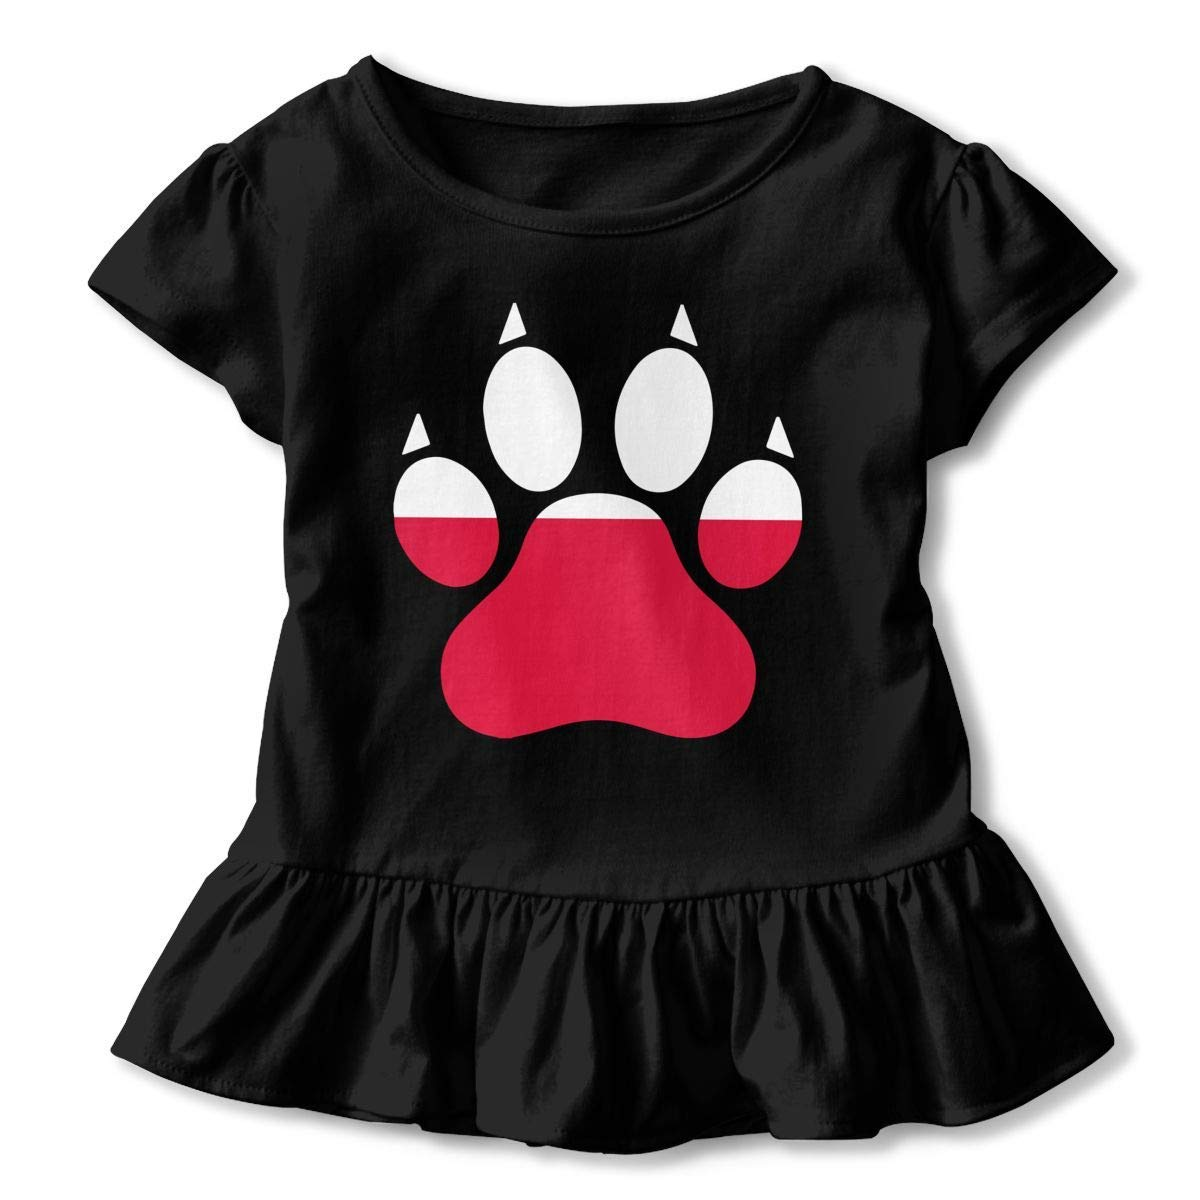 Short Sleeve Poland Flag Dog Paw T-Shirts for Girls Kawaii Sweatshirt with Falbala 2-6T